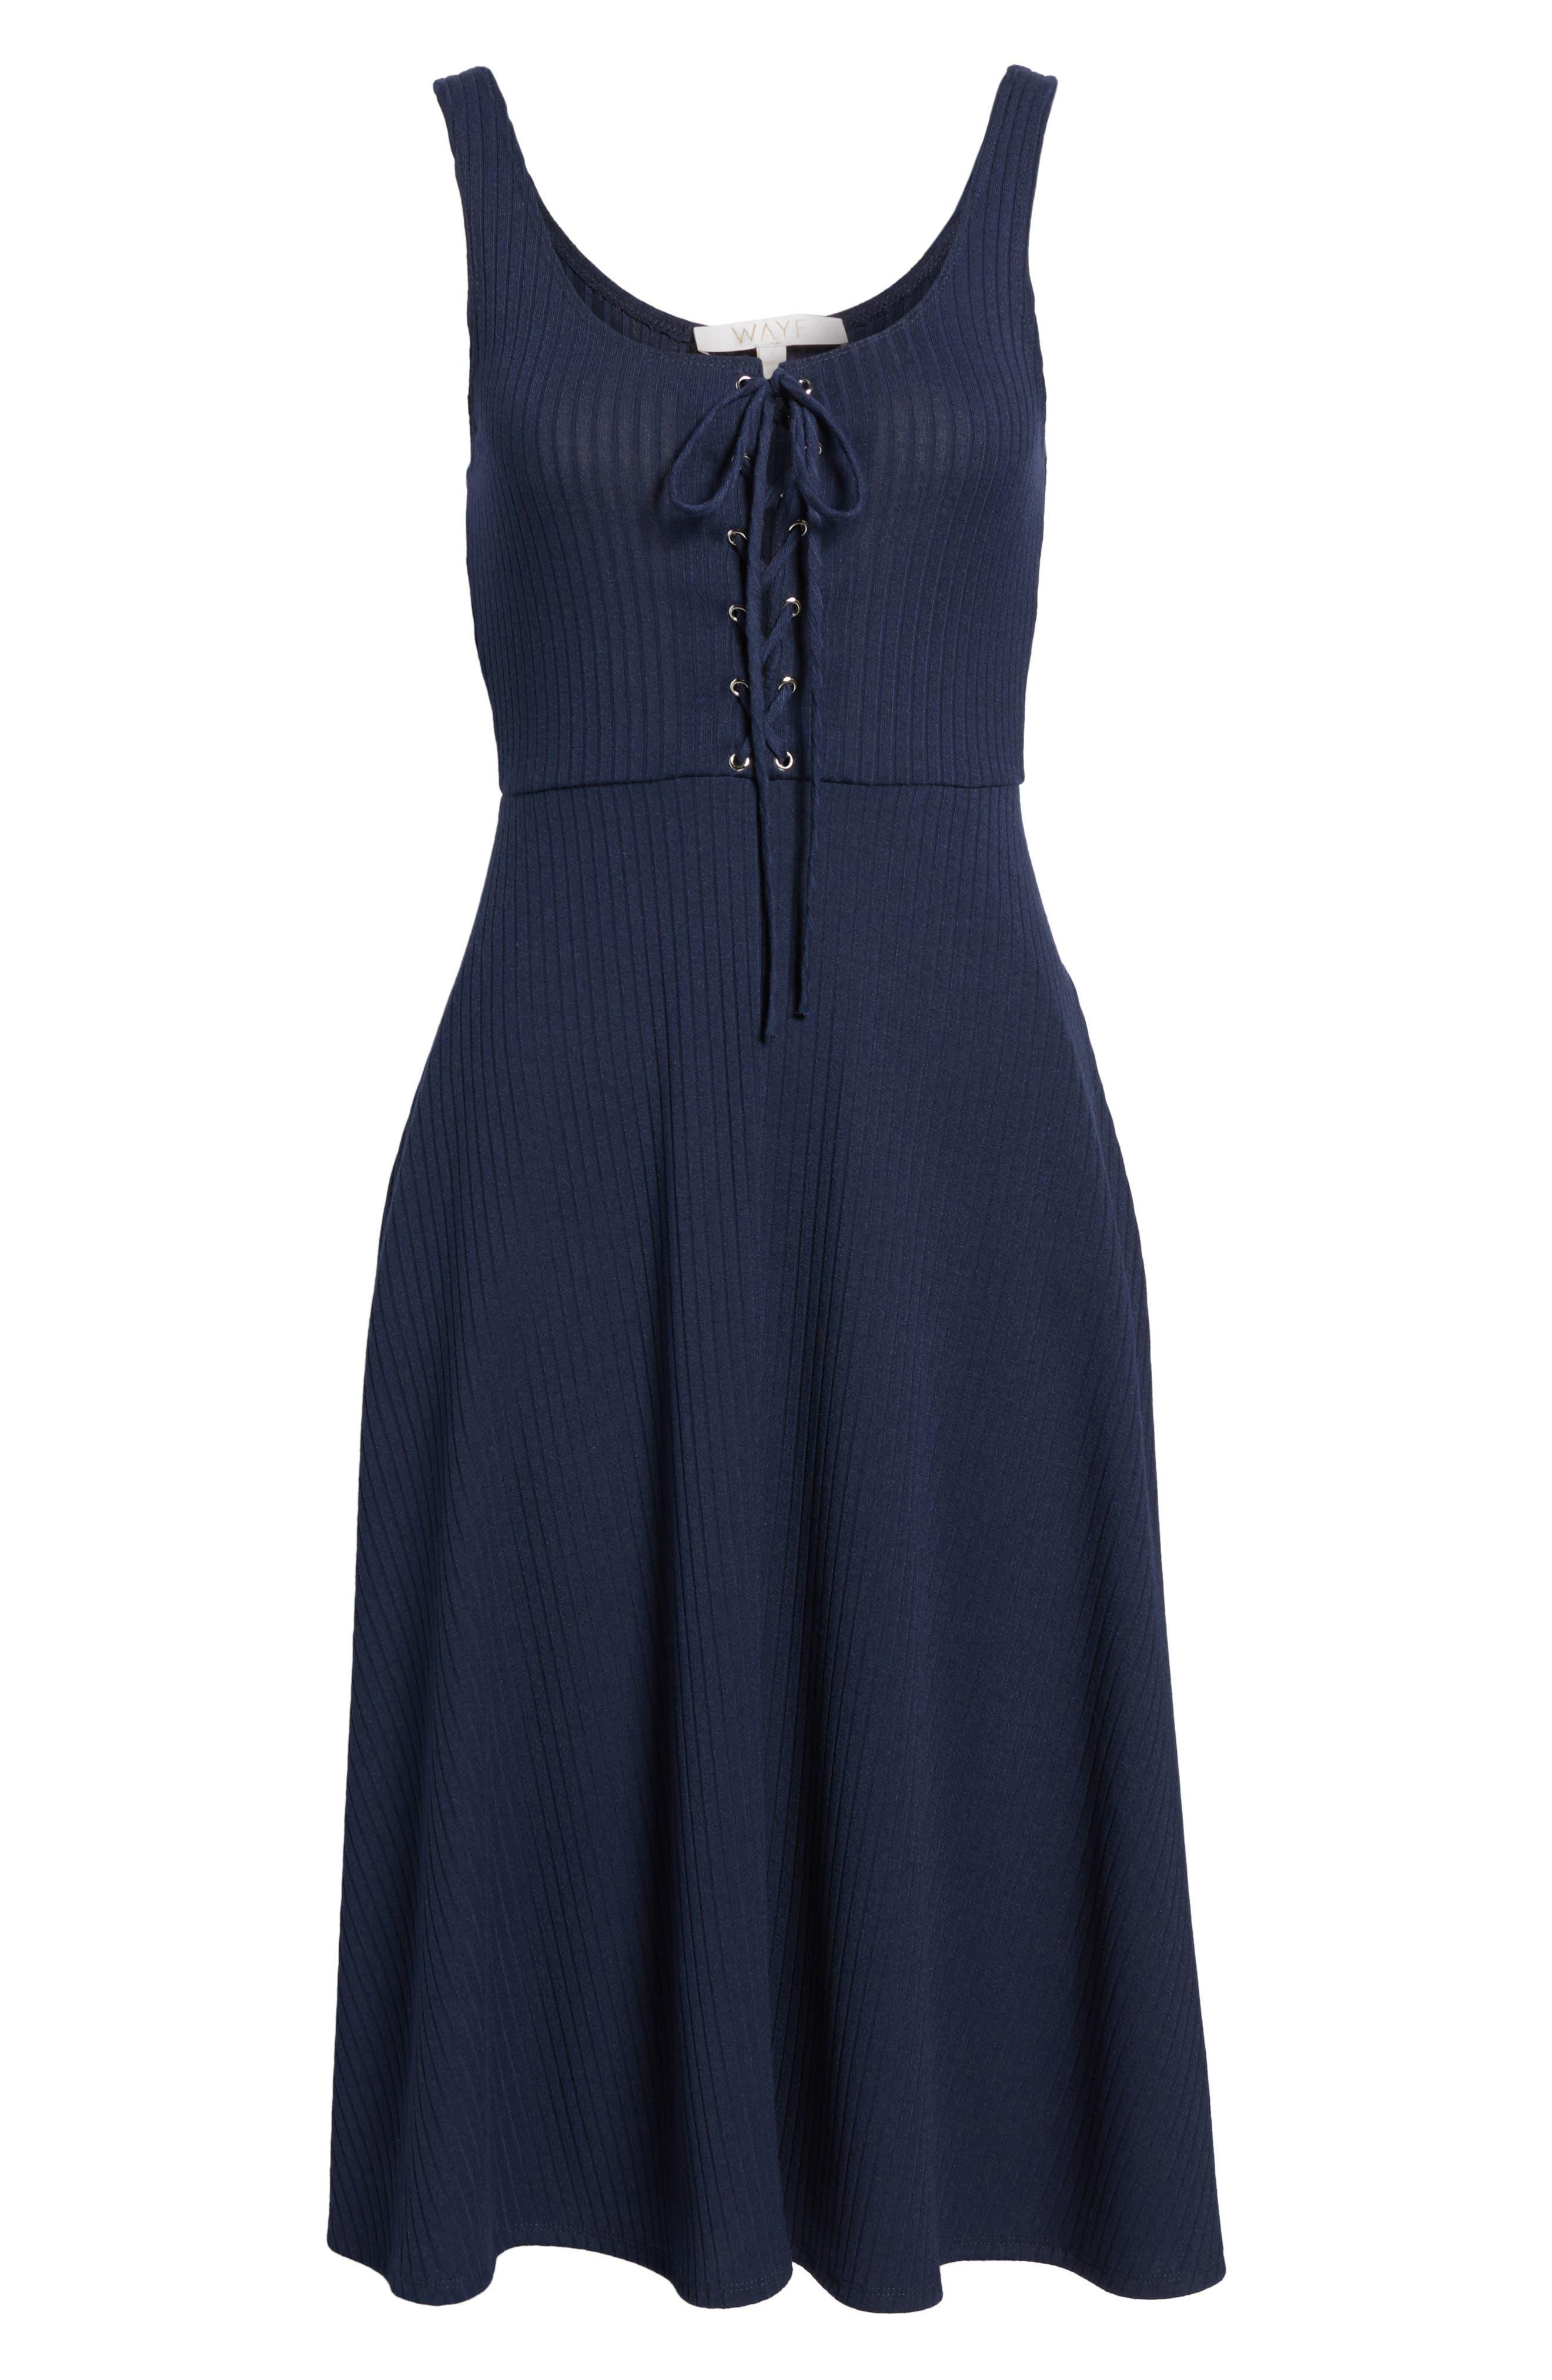 Fawn Lace-Up Midi Dress,                             Alternate thumbnail 6, color,                             400